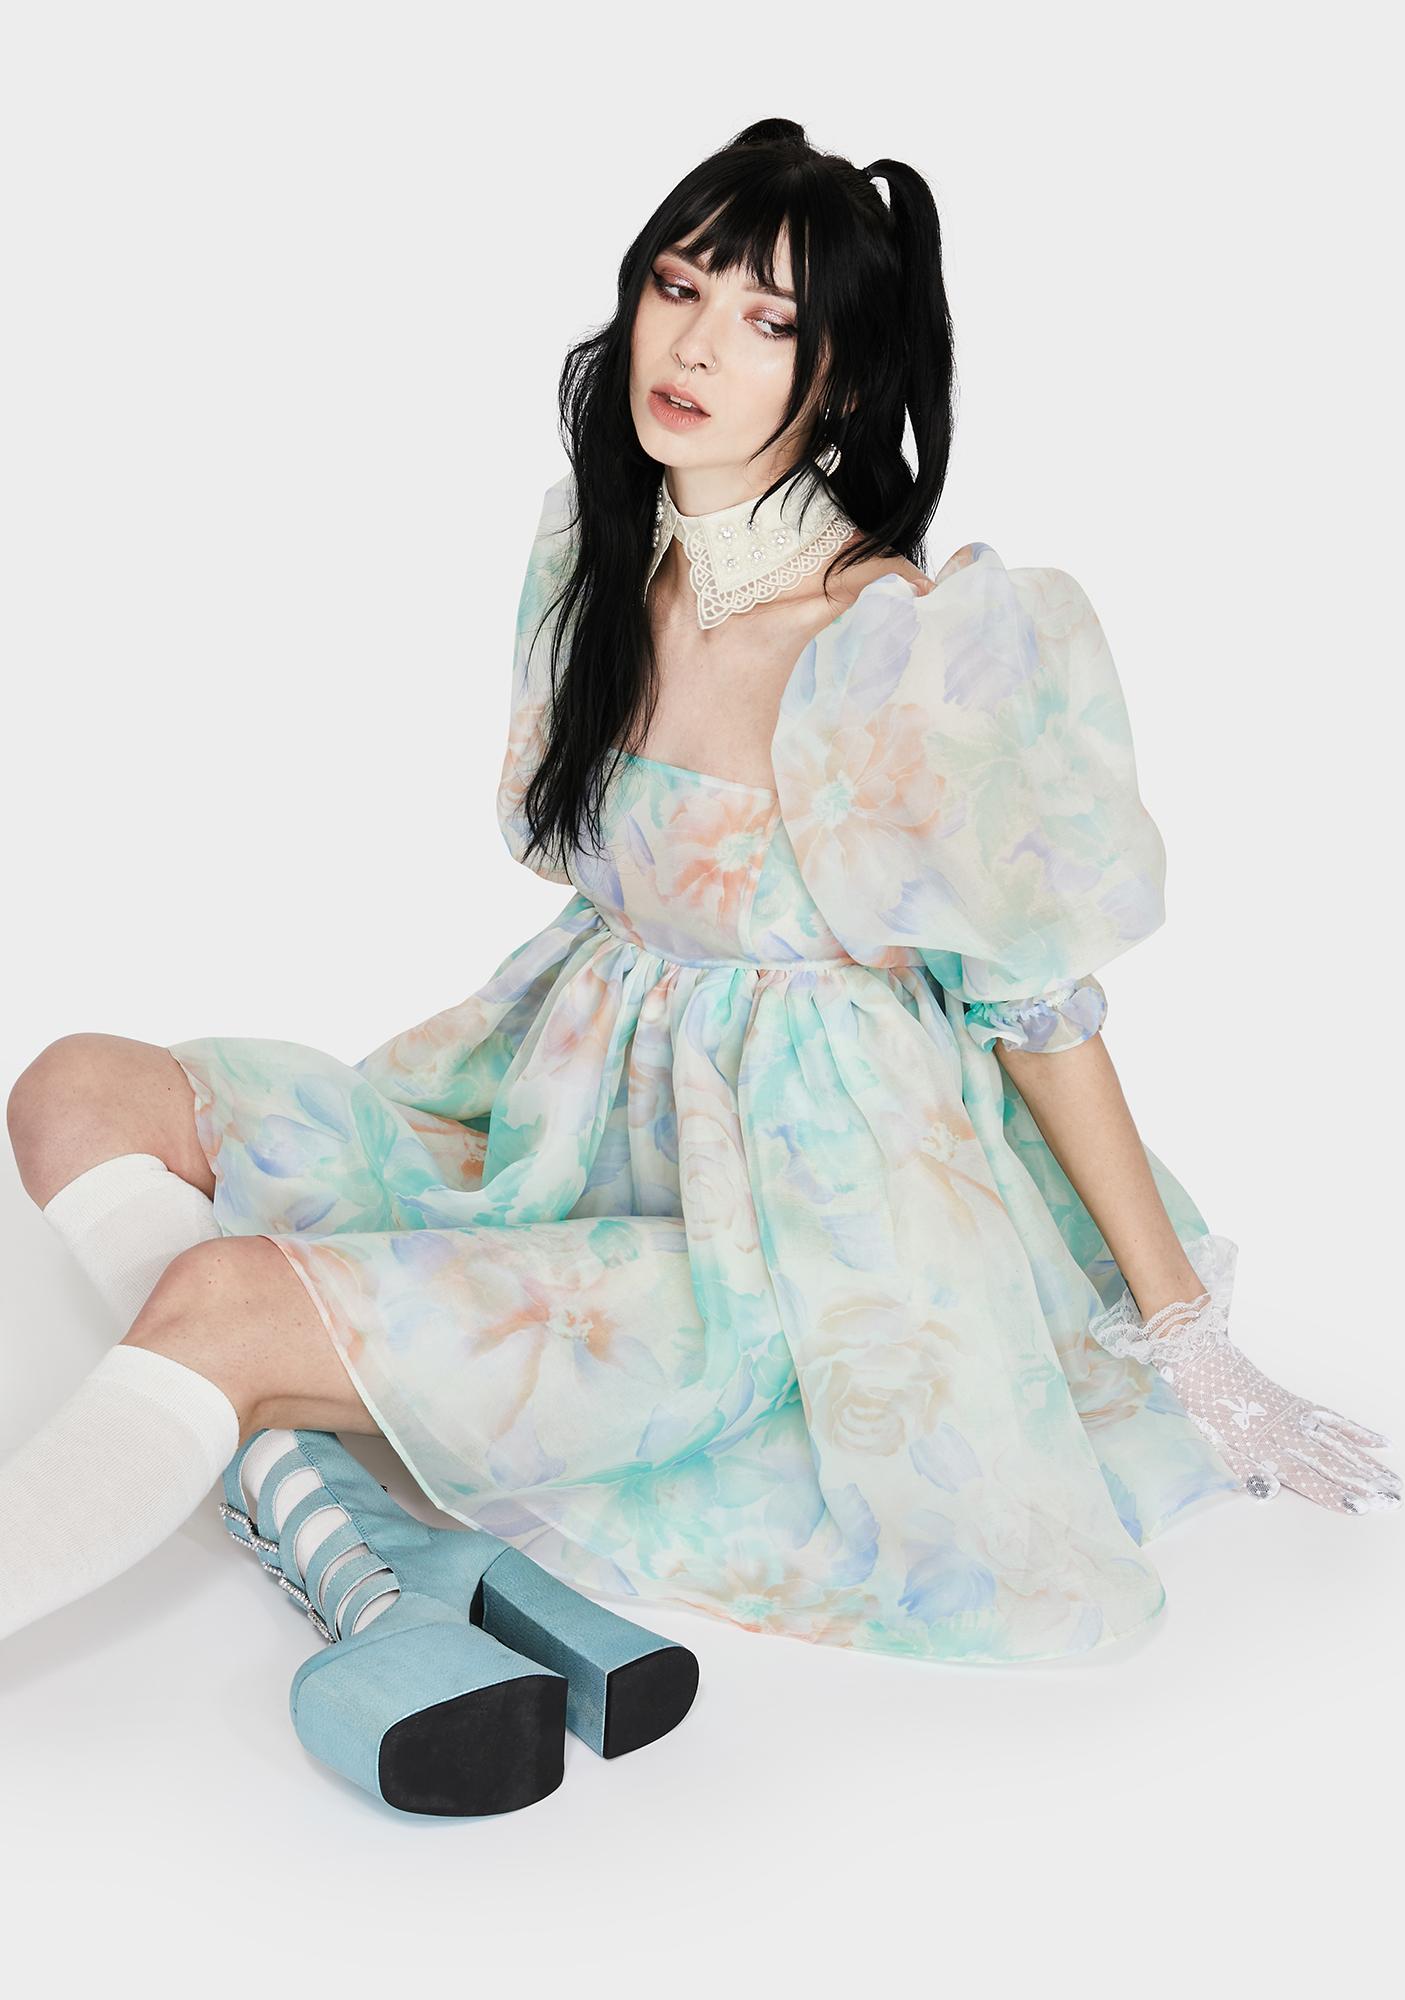 Selkie Miami Sofa Puff Dress